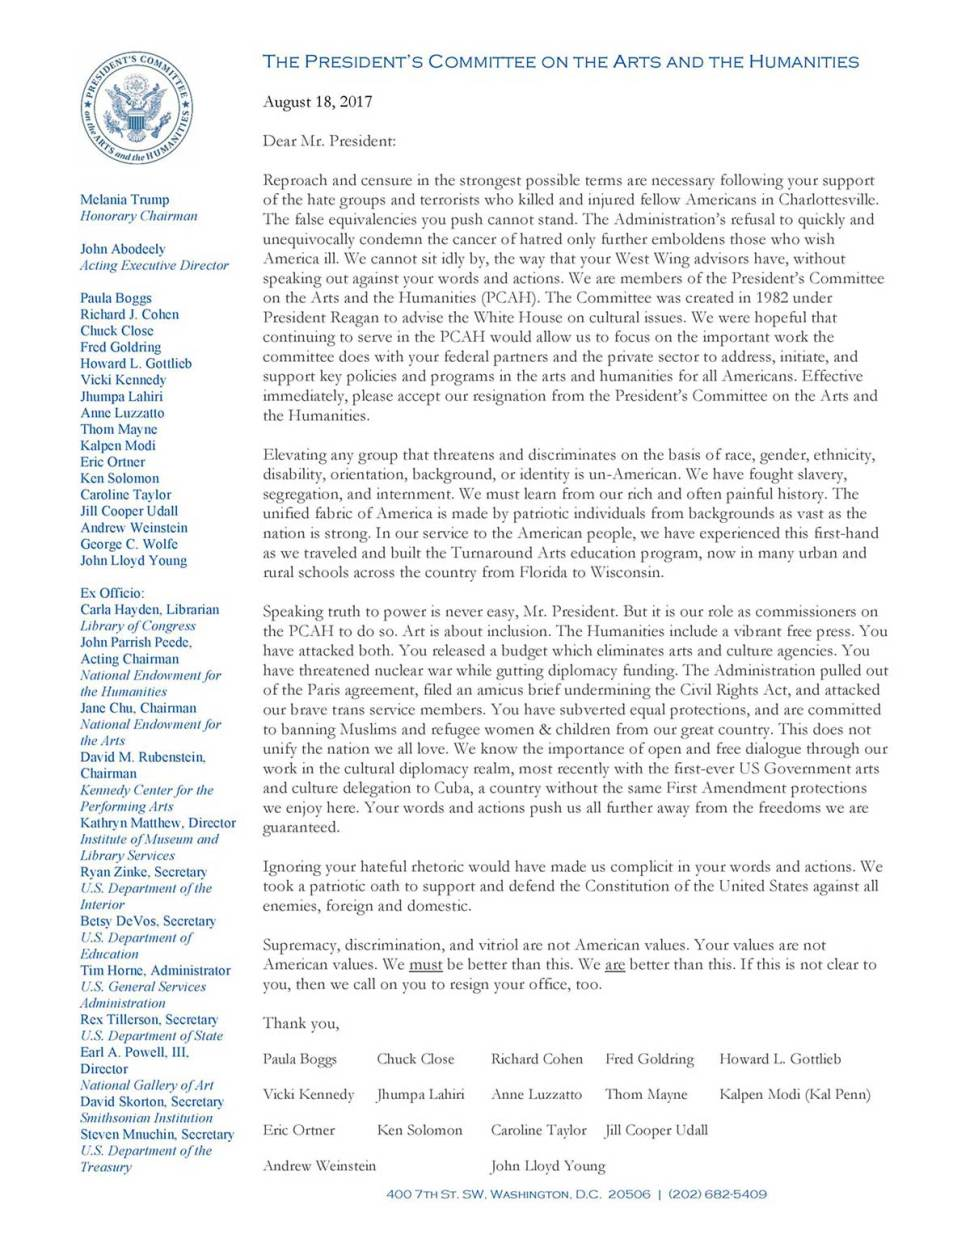 Hidden Message In Mass Resignation Letter From President Trumps